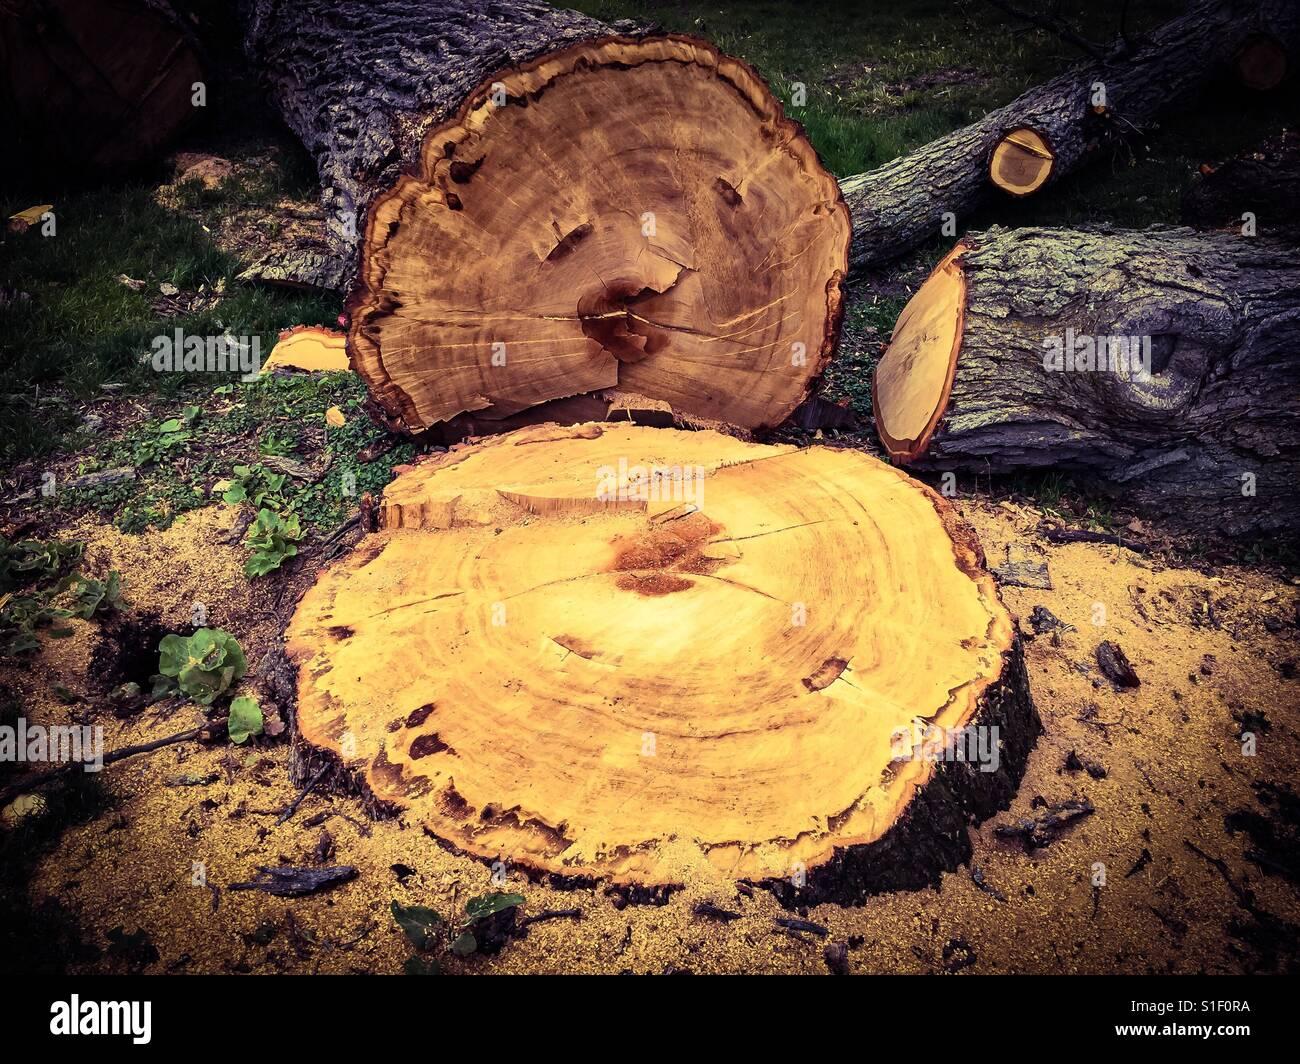 Big tree cut down - Stock Image